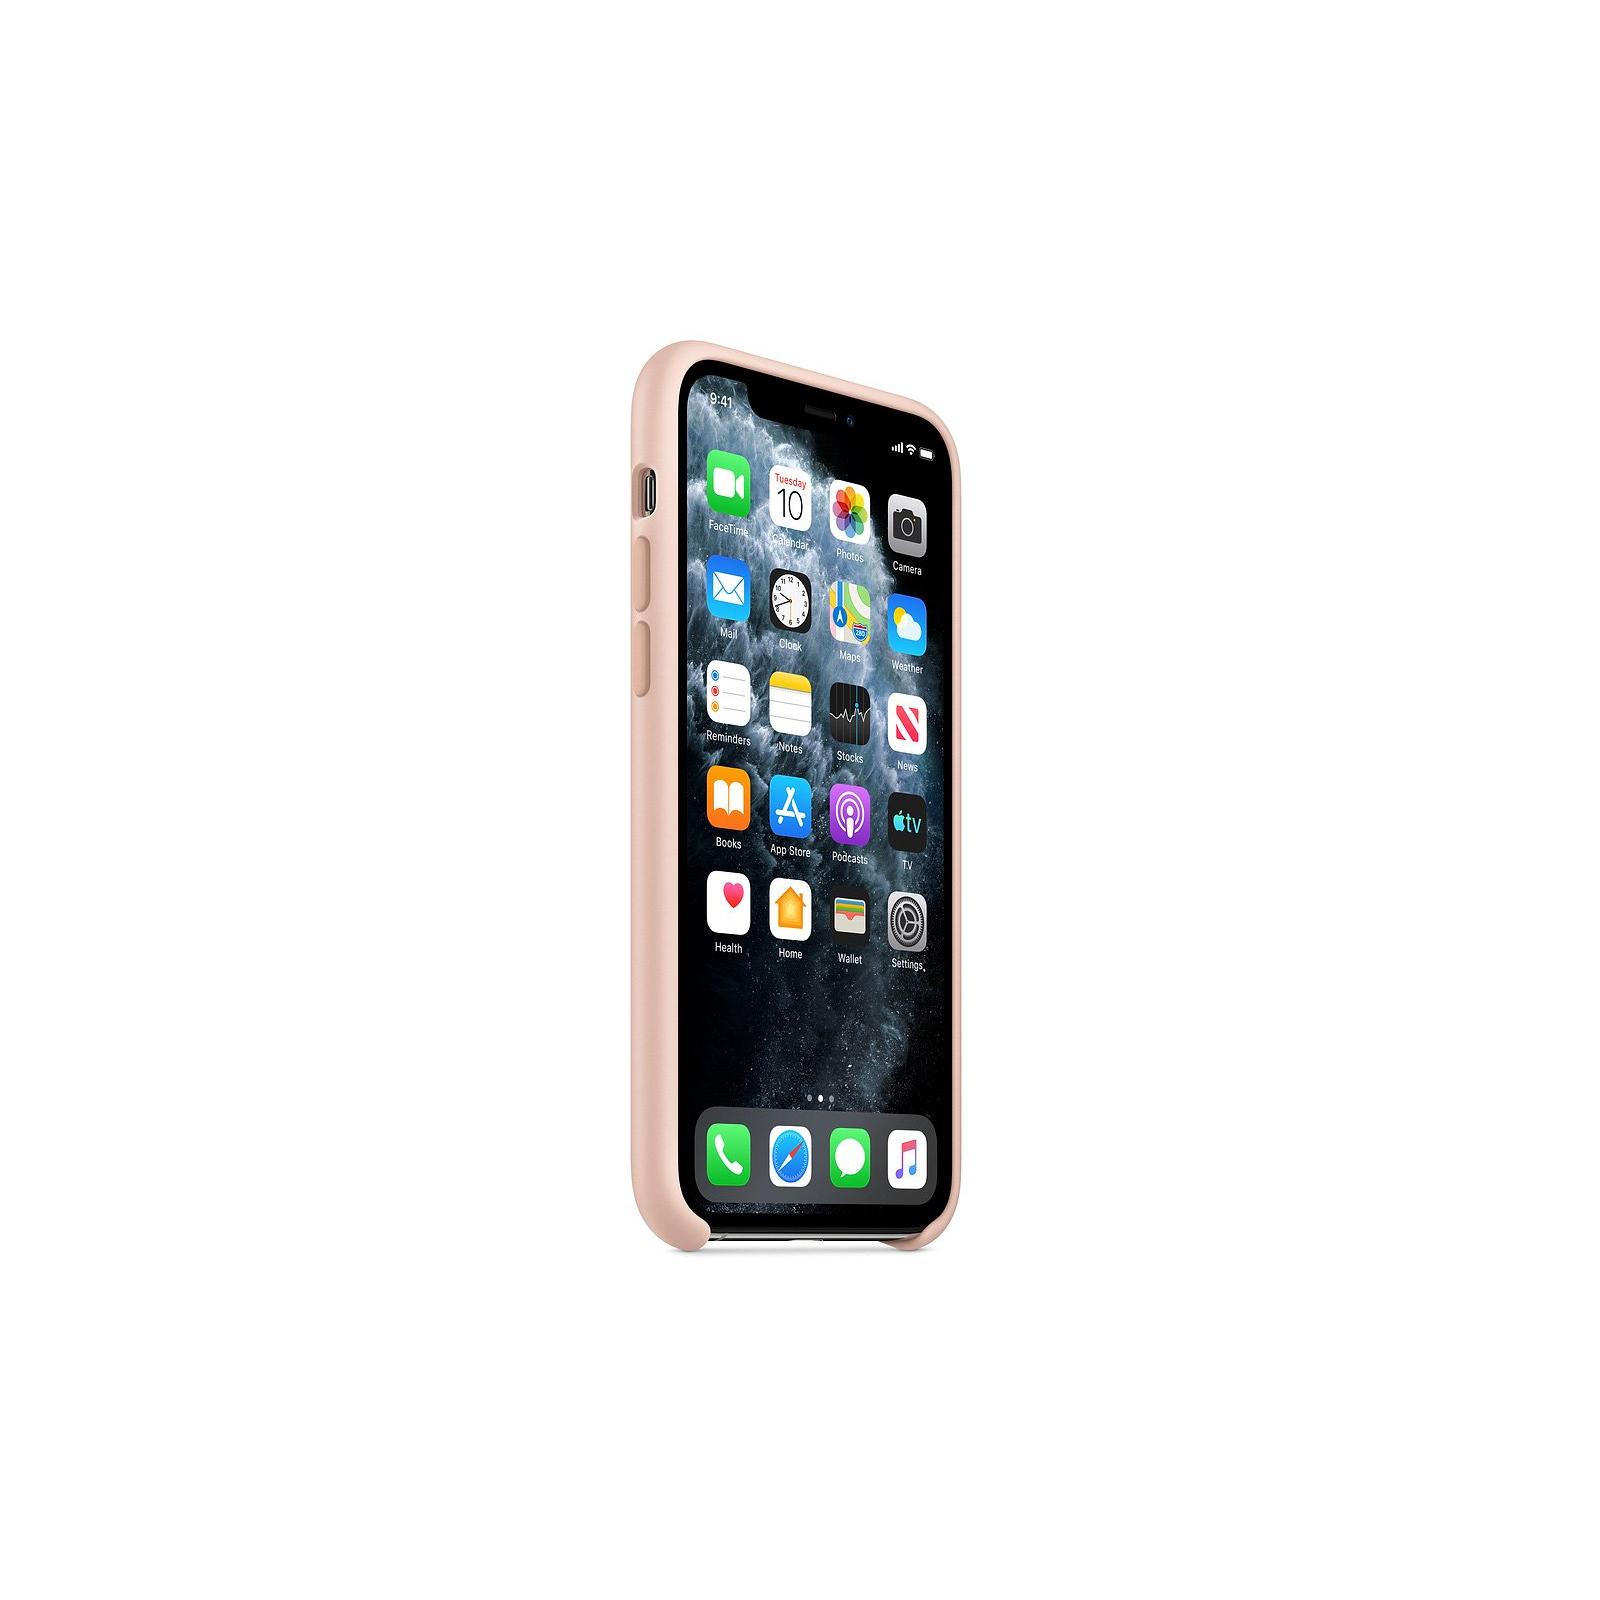 Чехол для моб. телефона Apple iPhone 11 Pro Max Silicone Case - Pine Green (MX012ZM/A) изображение 5